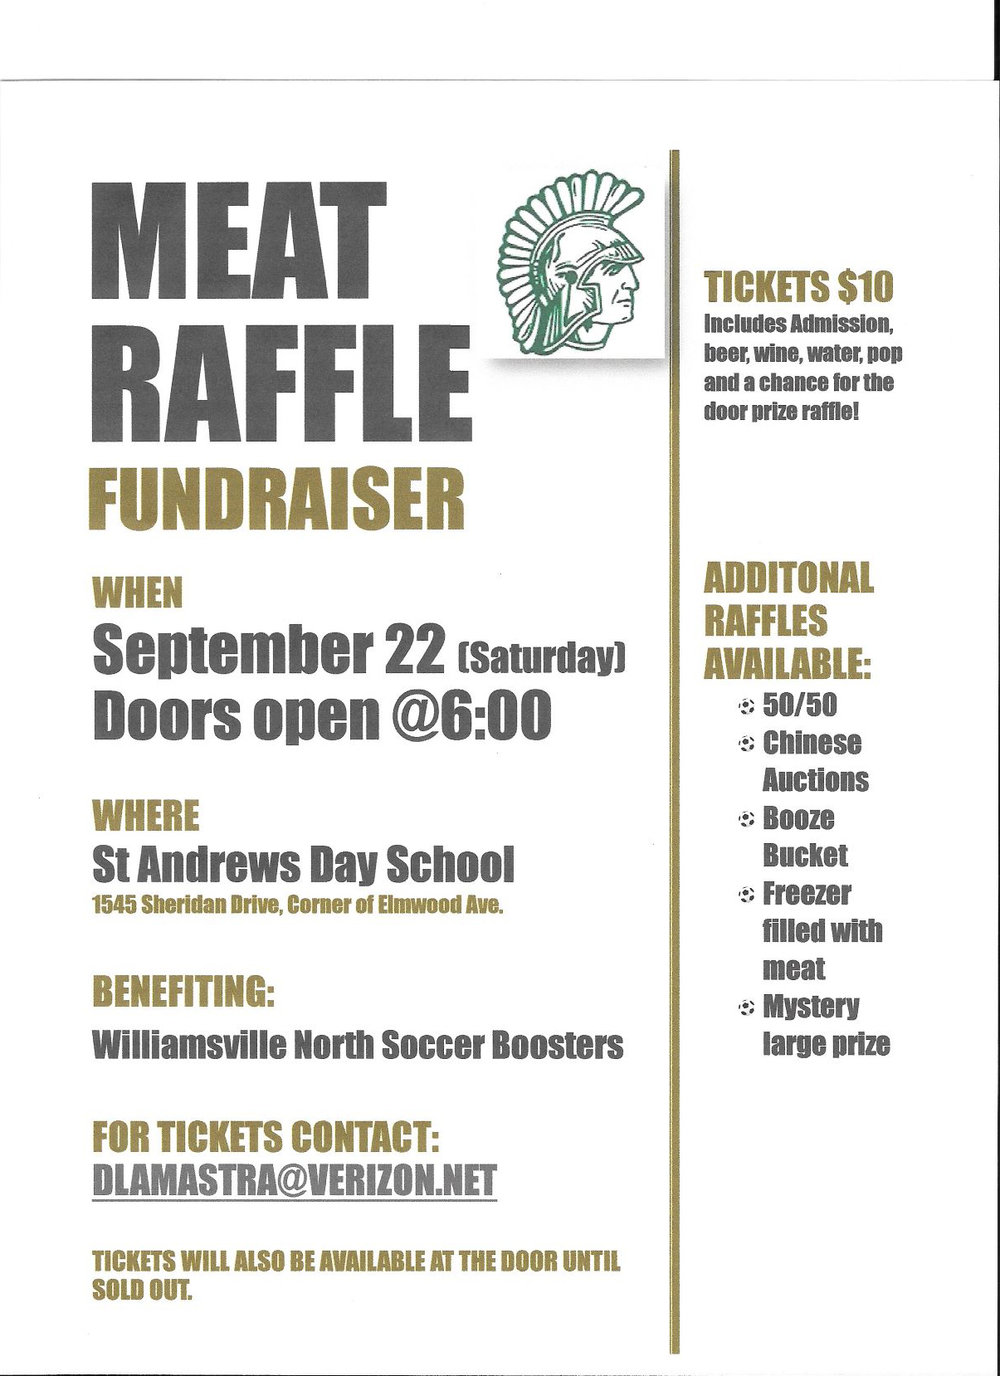 MEAT RAFFLE Fundraiser flyer  jpg.jpg